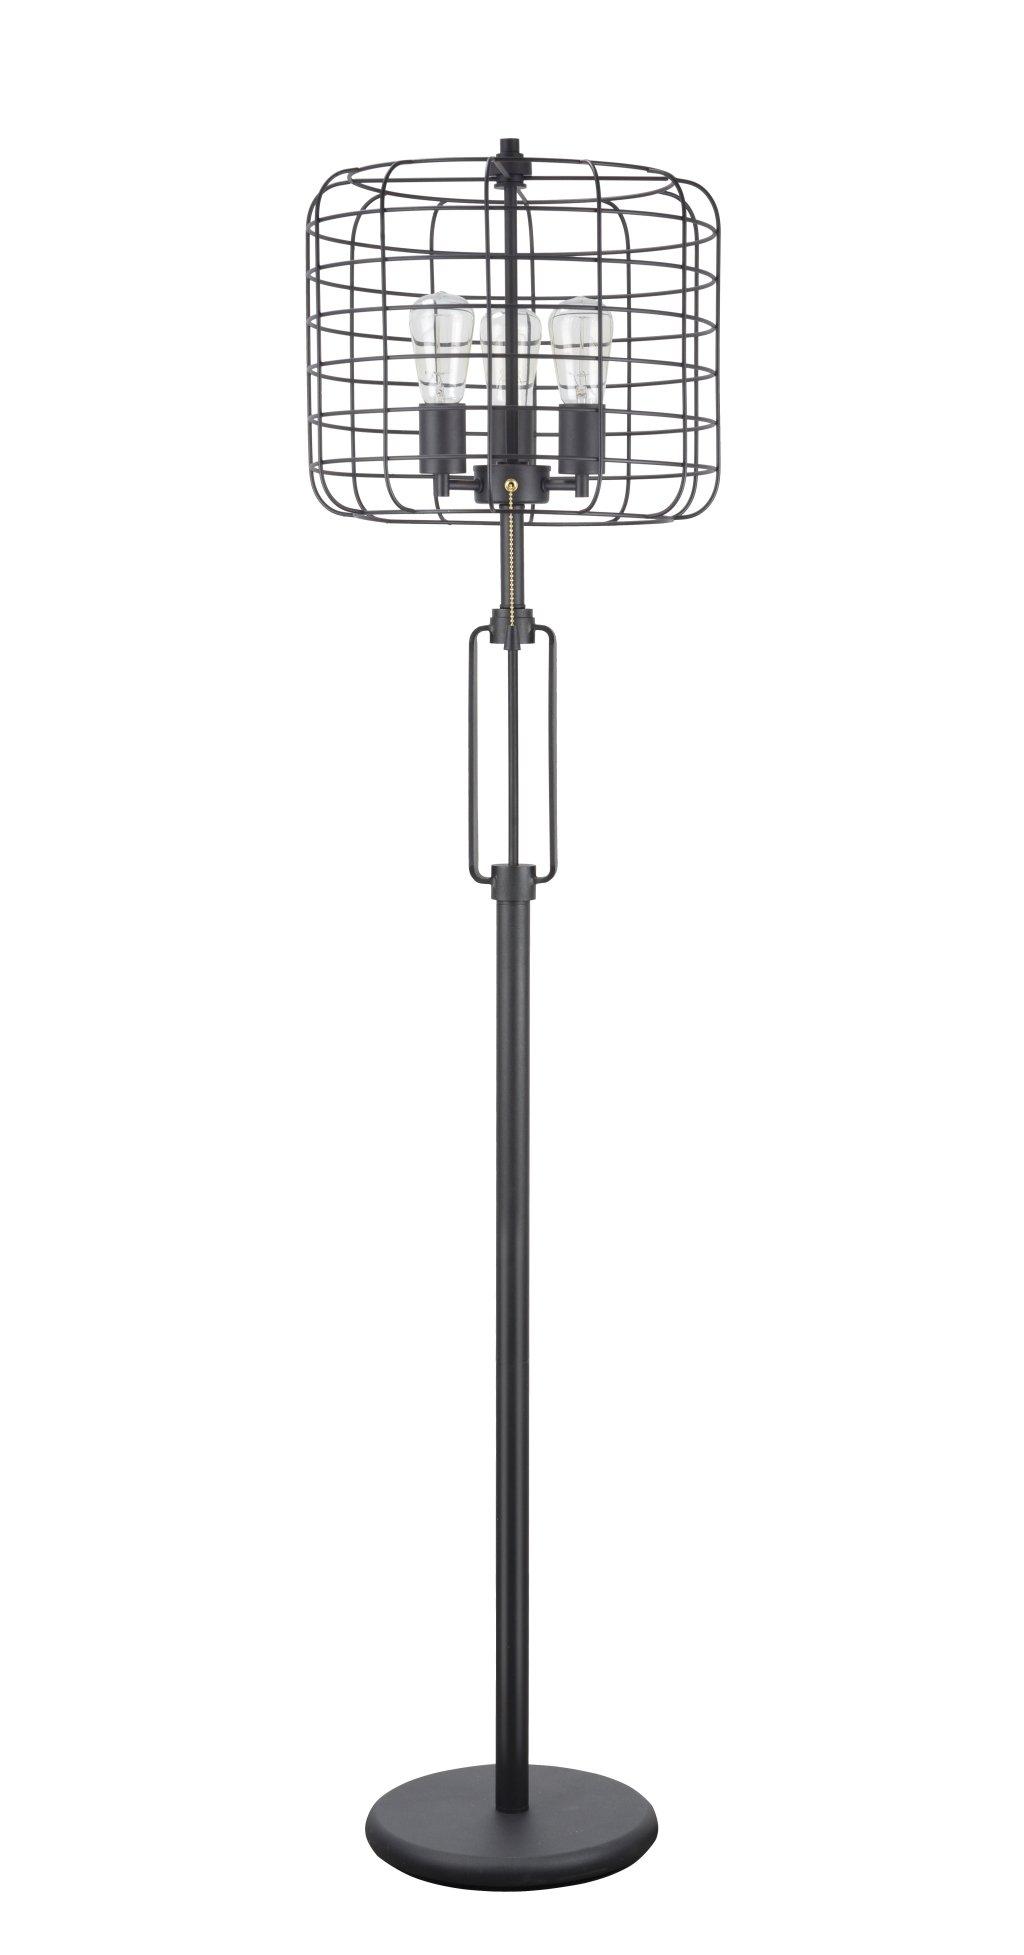 Aspen Creative 45008 63'' High Wire Cage Metal Floor Lamp, Vintage Design, Sand Black